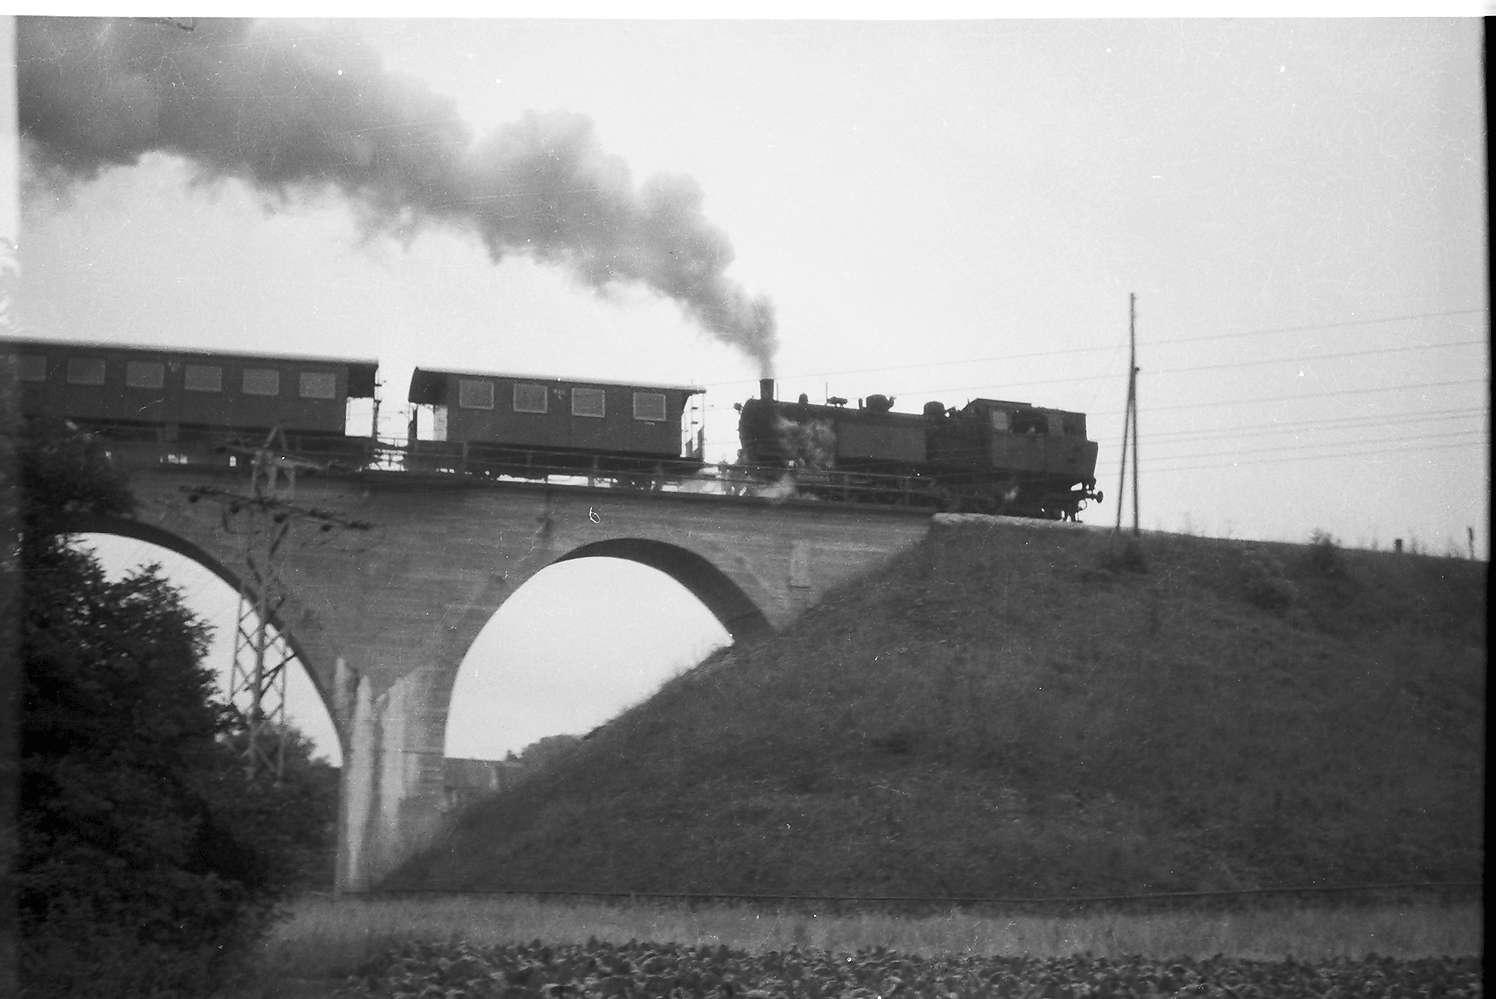 Lok 15, Viadukt Gammertingen, Bild 1